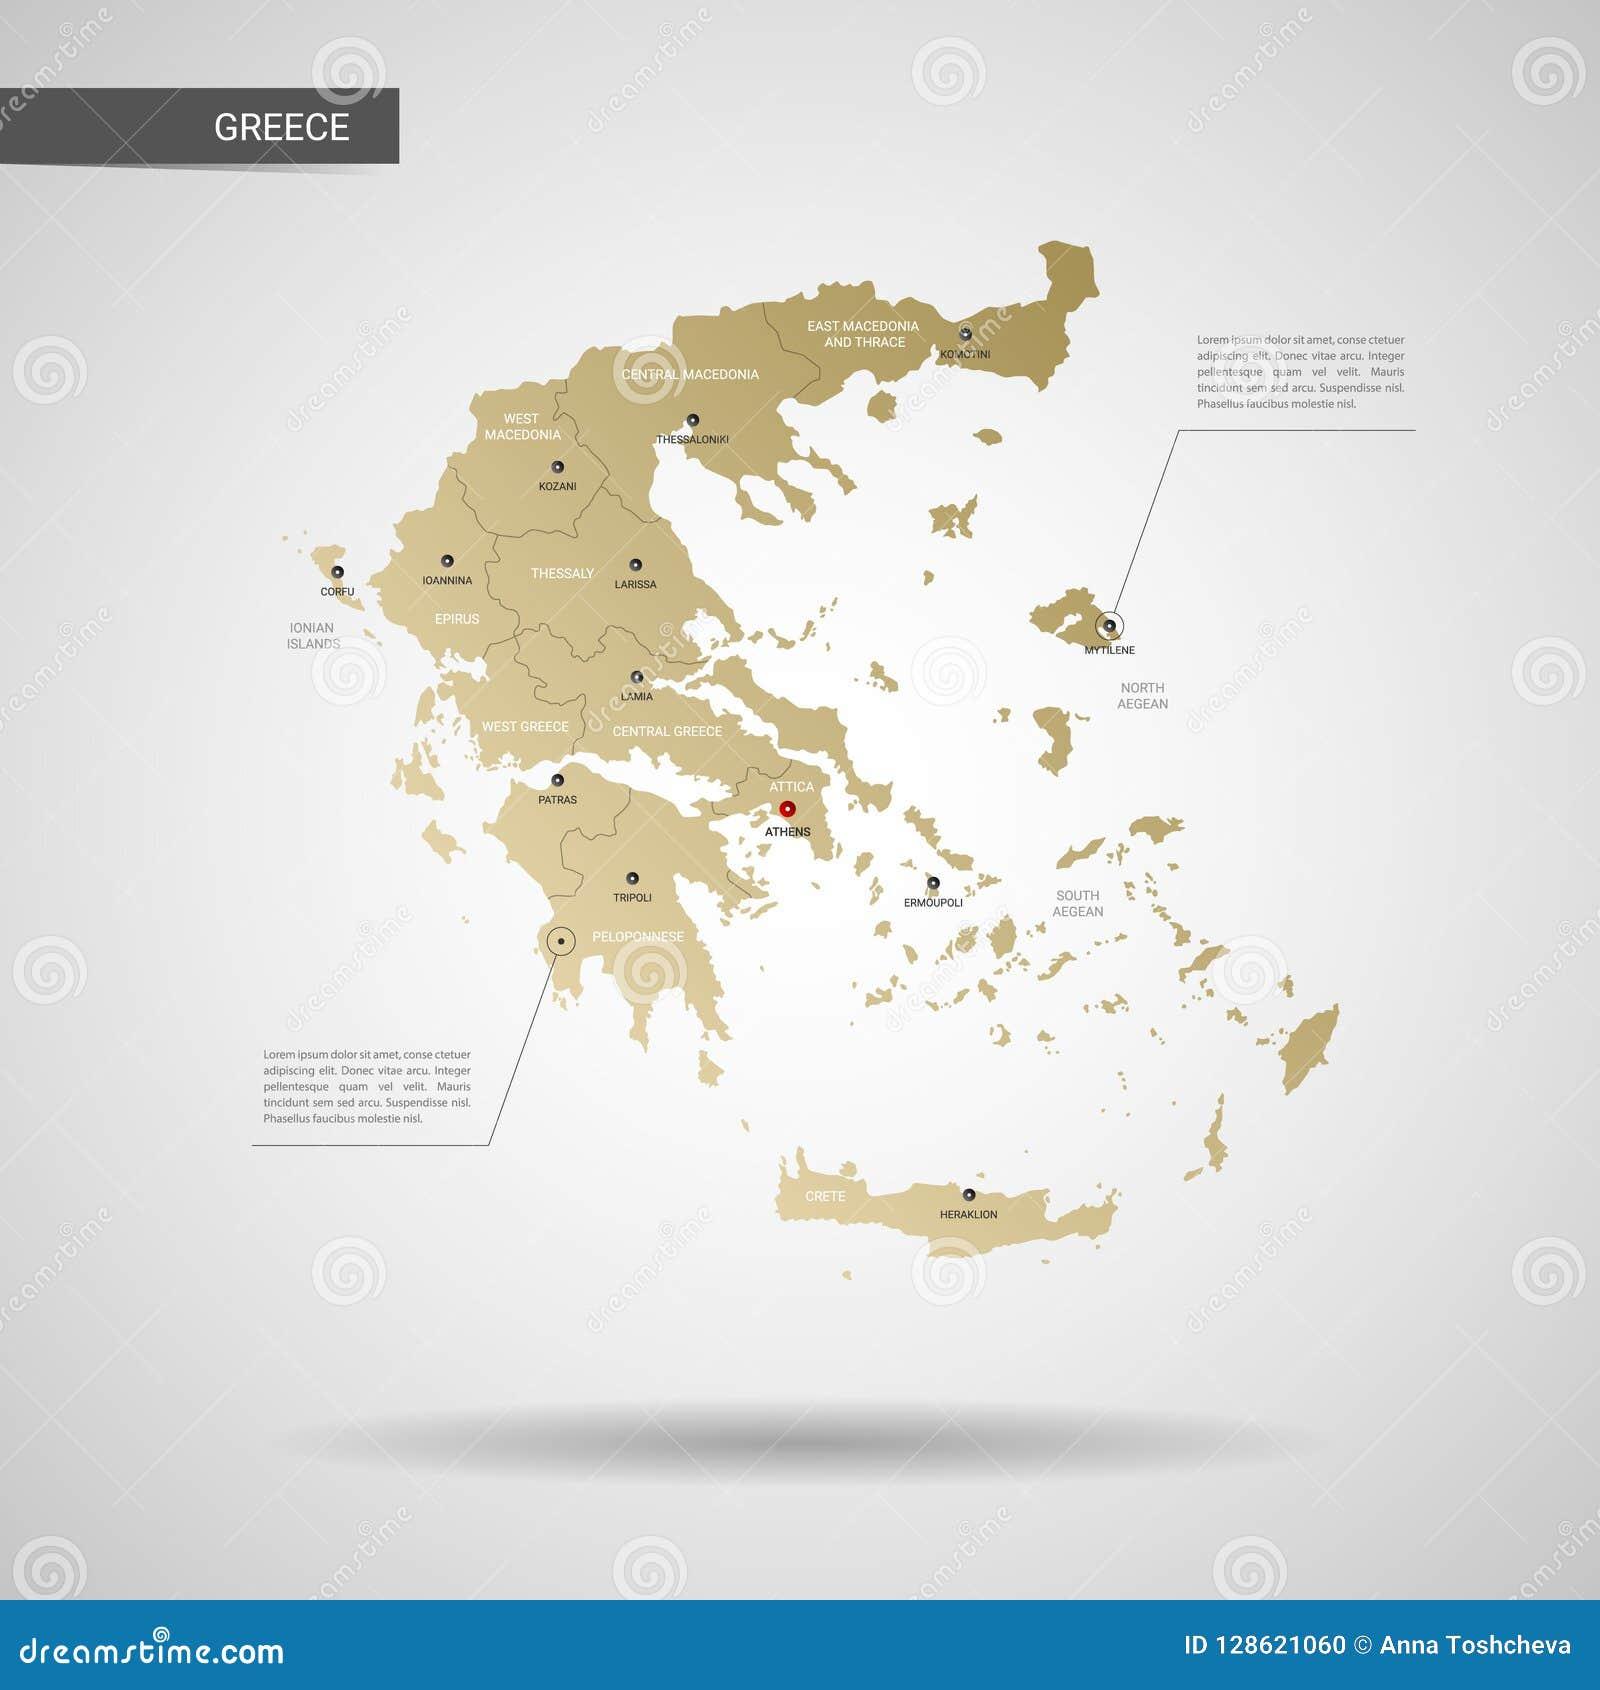 Stylized Greece Map Vector Illustration. Stock Vector - Illustration ...